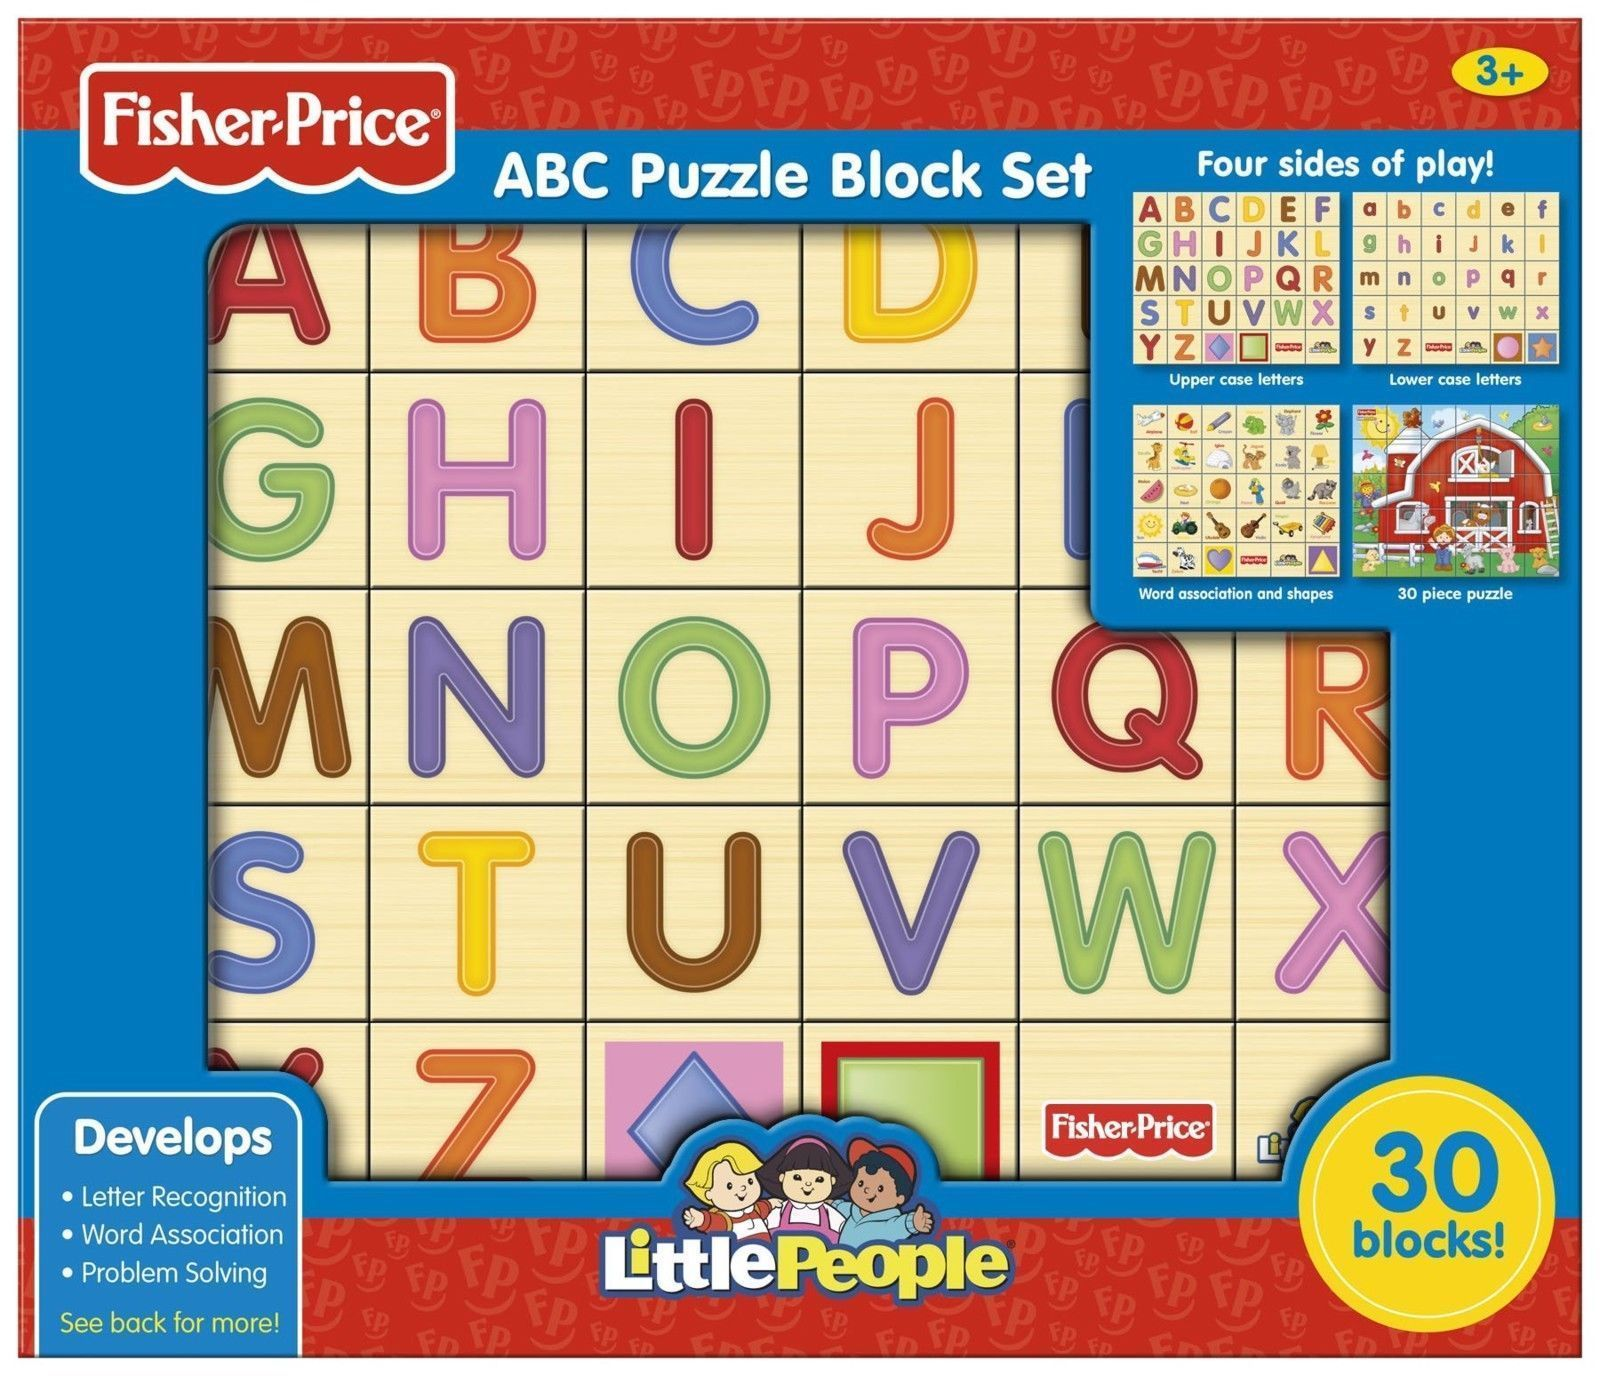 Alphabet And Language 145930 Fisher Price Abc Wooden Alphabet Puzzle Blocks Wood Set 30 Pieces Building Toys Buy It Now Only Abc Puzzle Abc Alphabet Abc